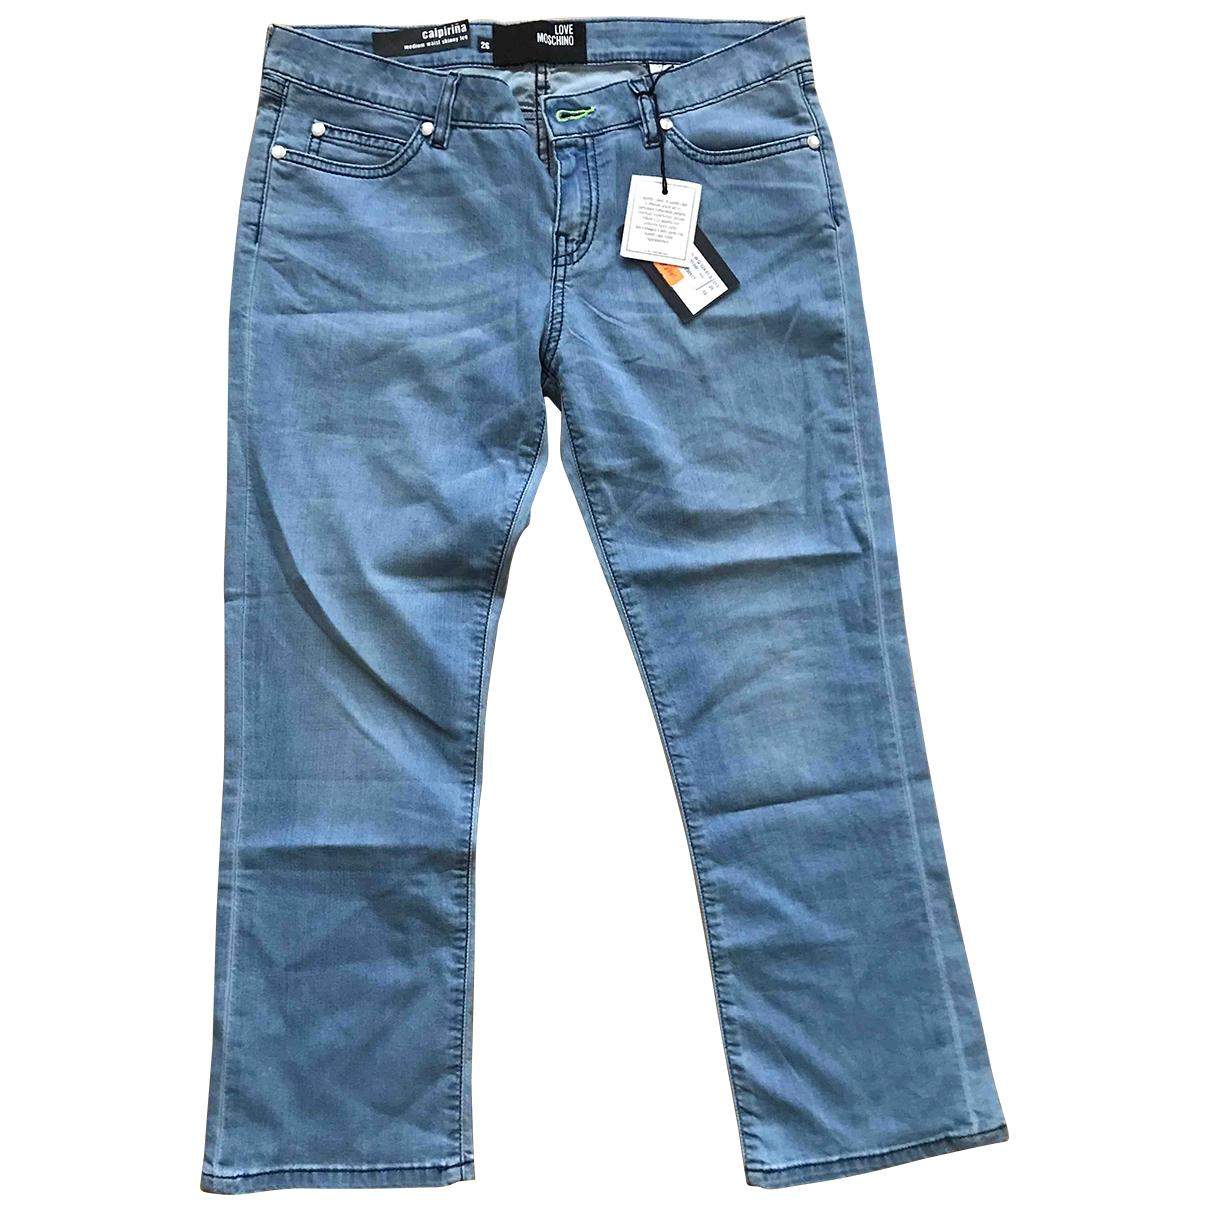 Moschino Love \N Jeans in  Blau Baumwolle - Elasthan